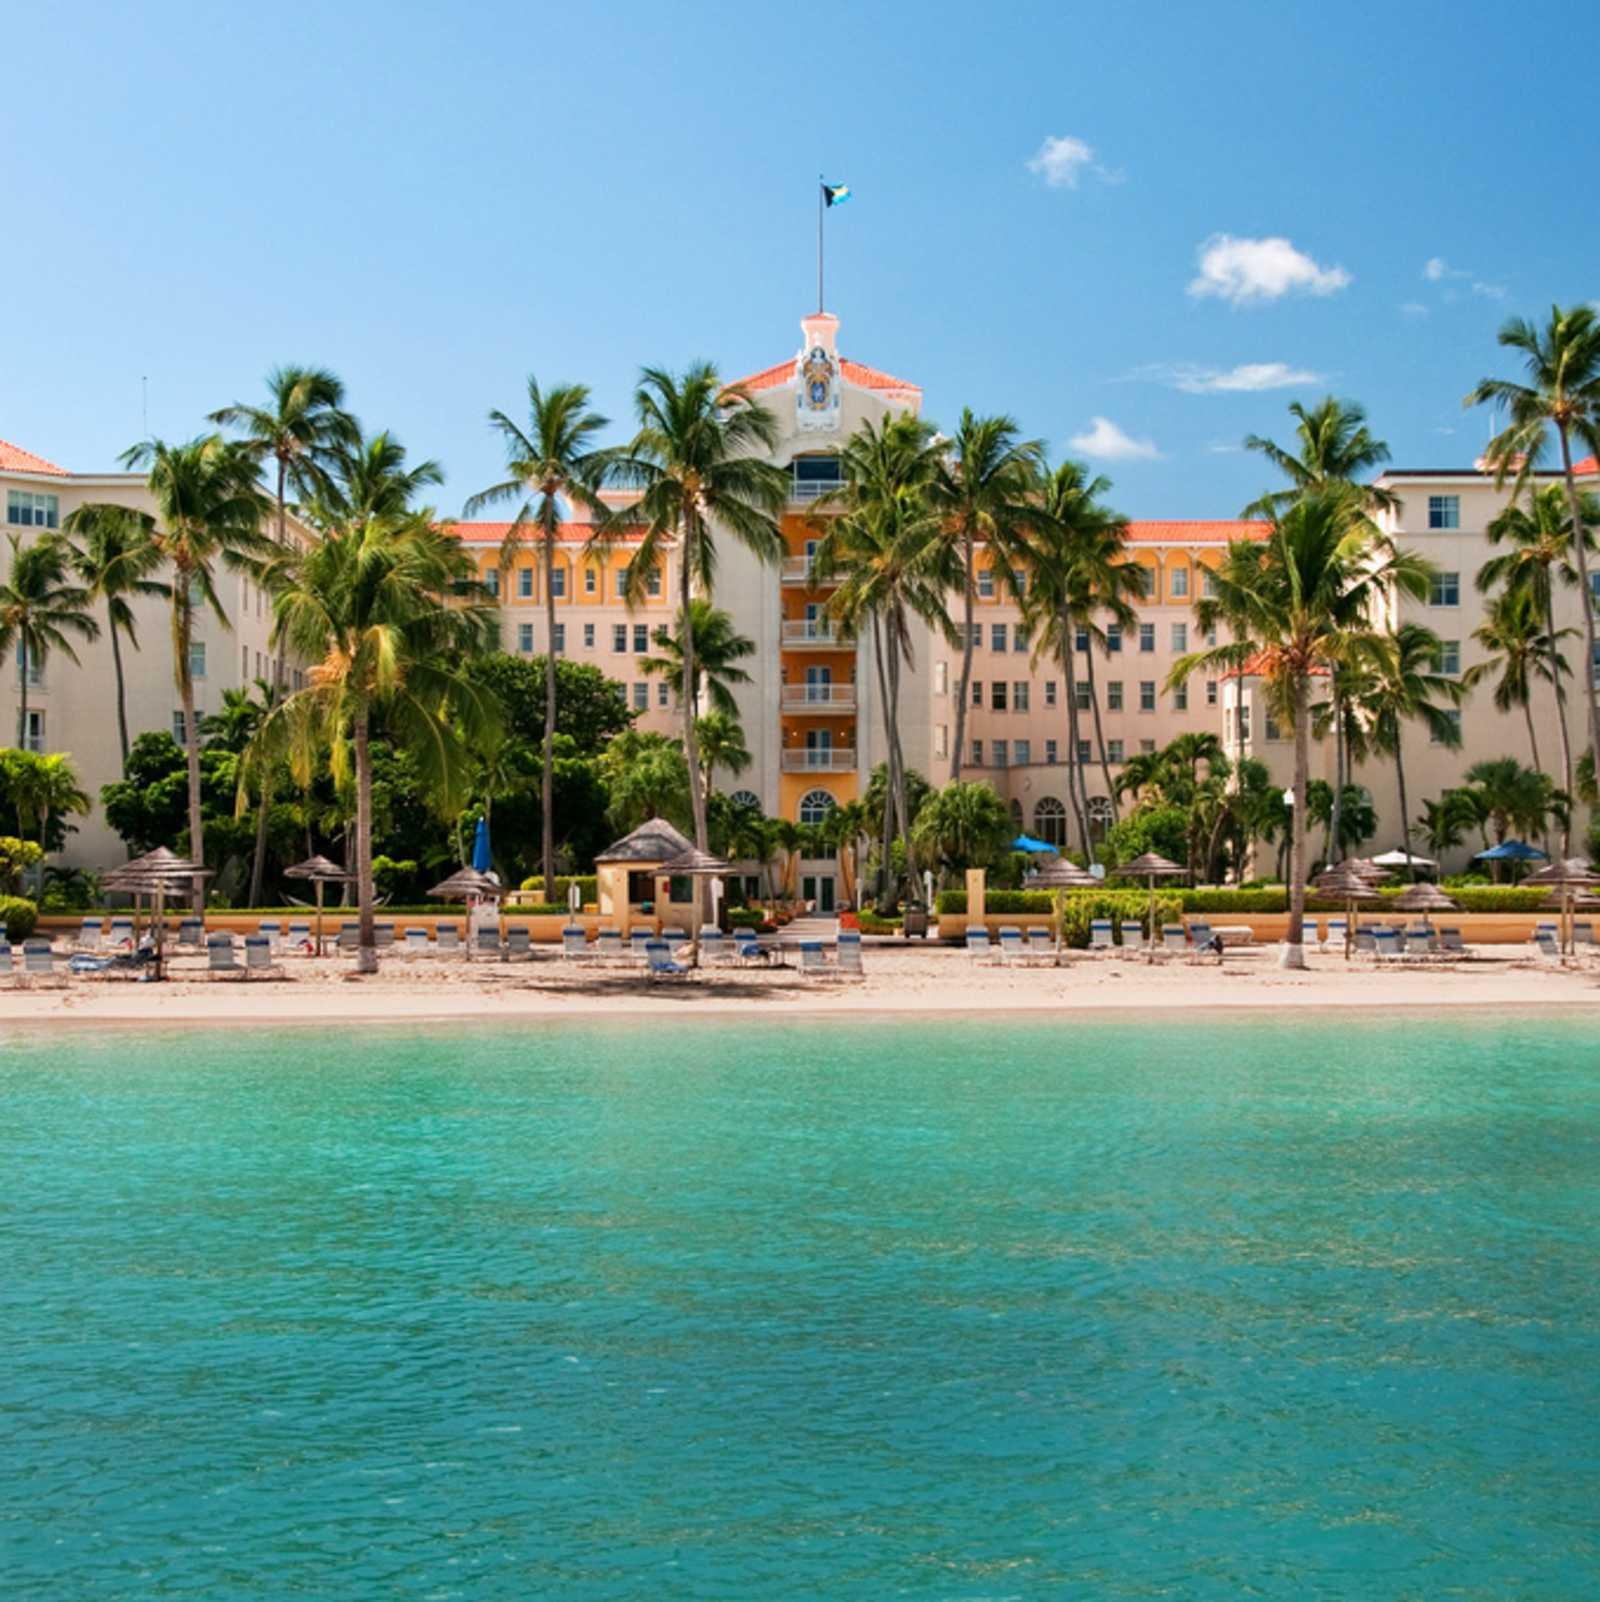 British Colonial Hilton